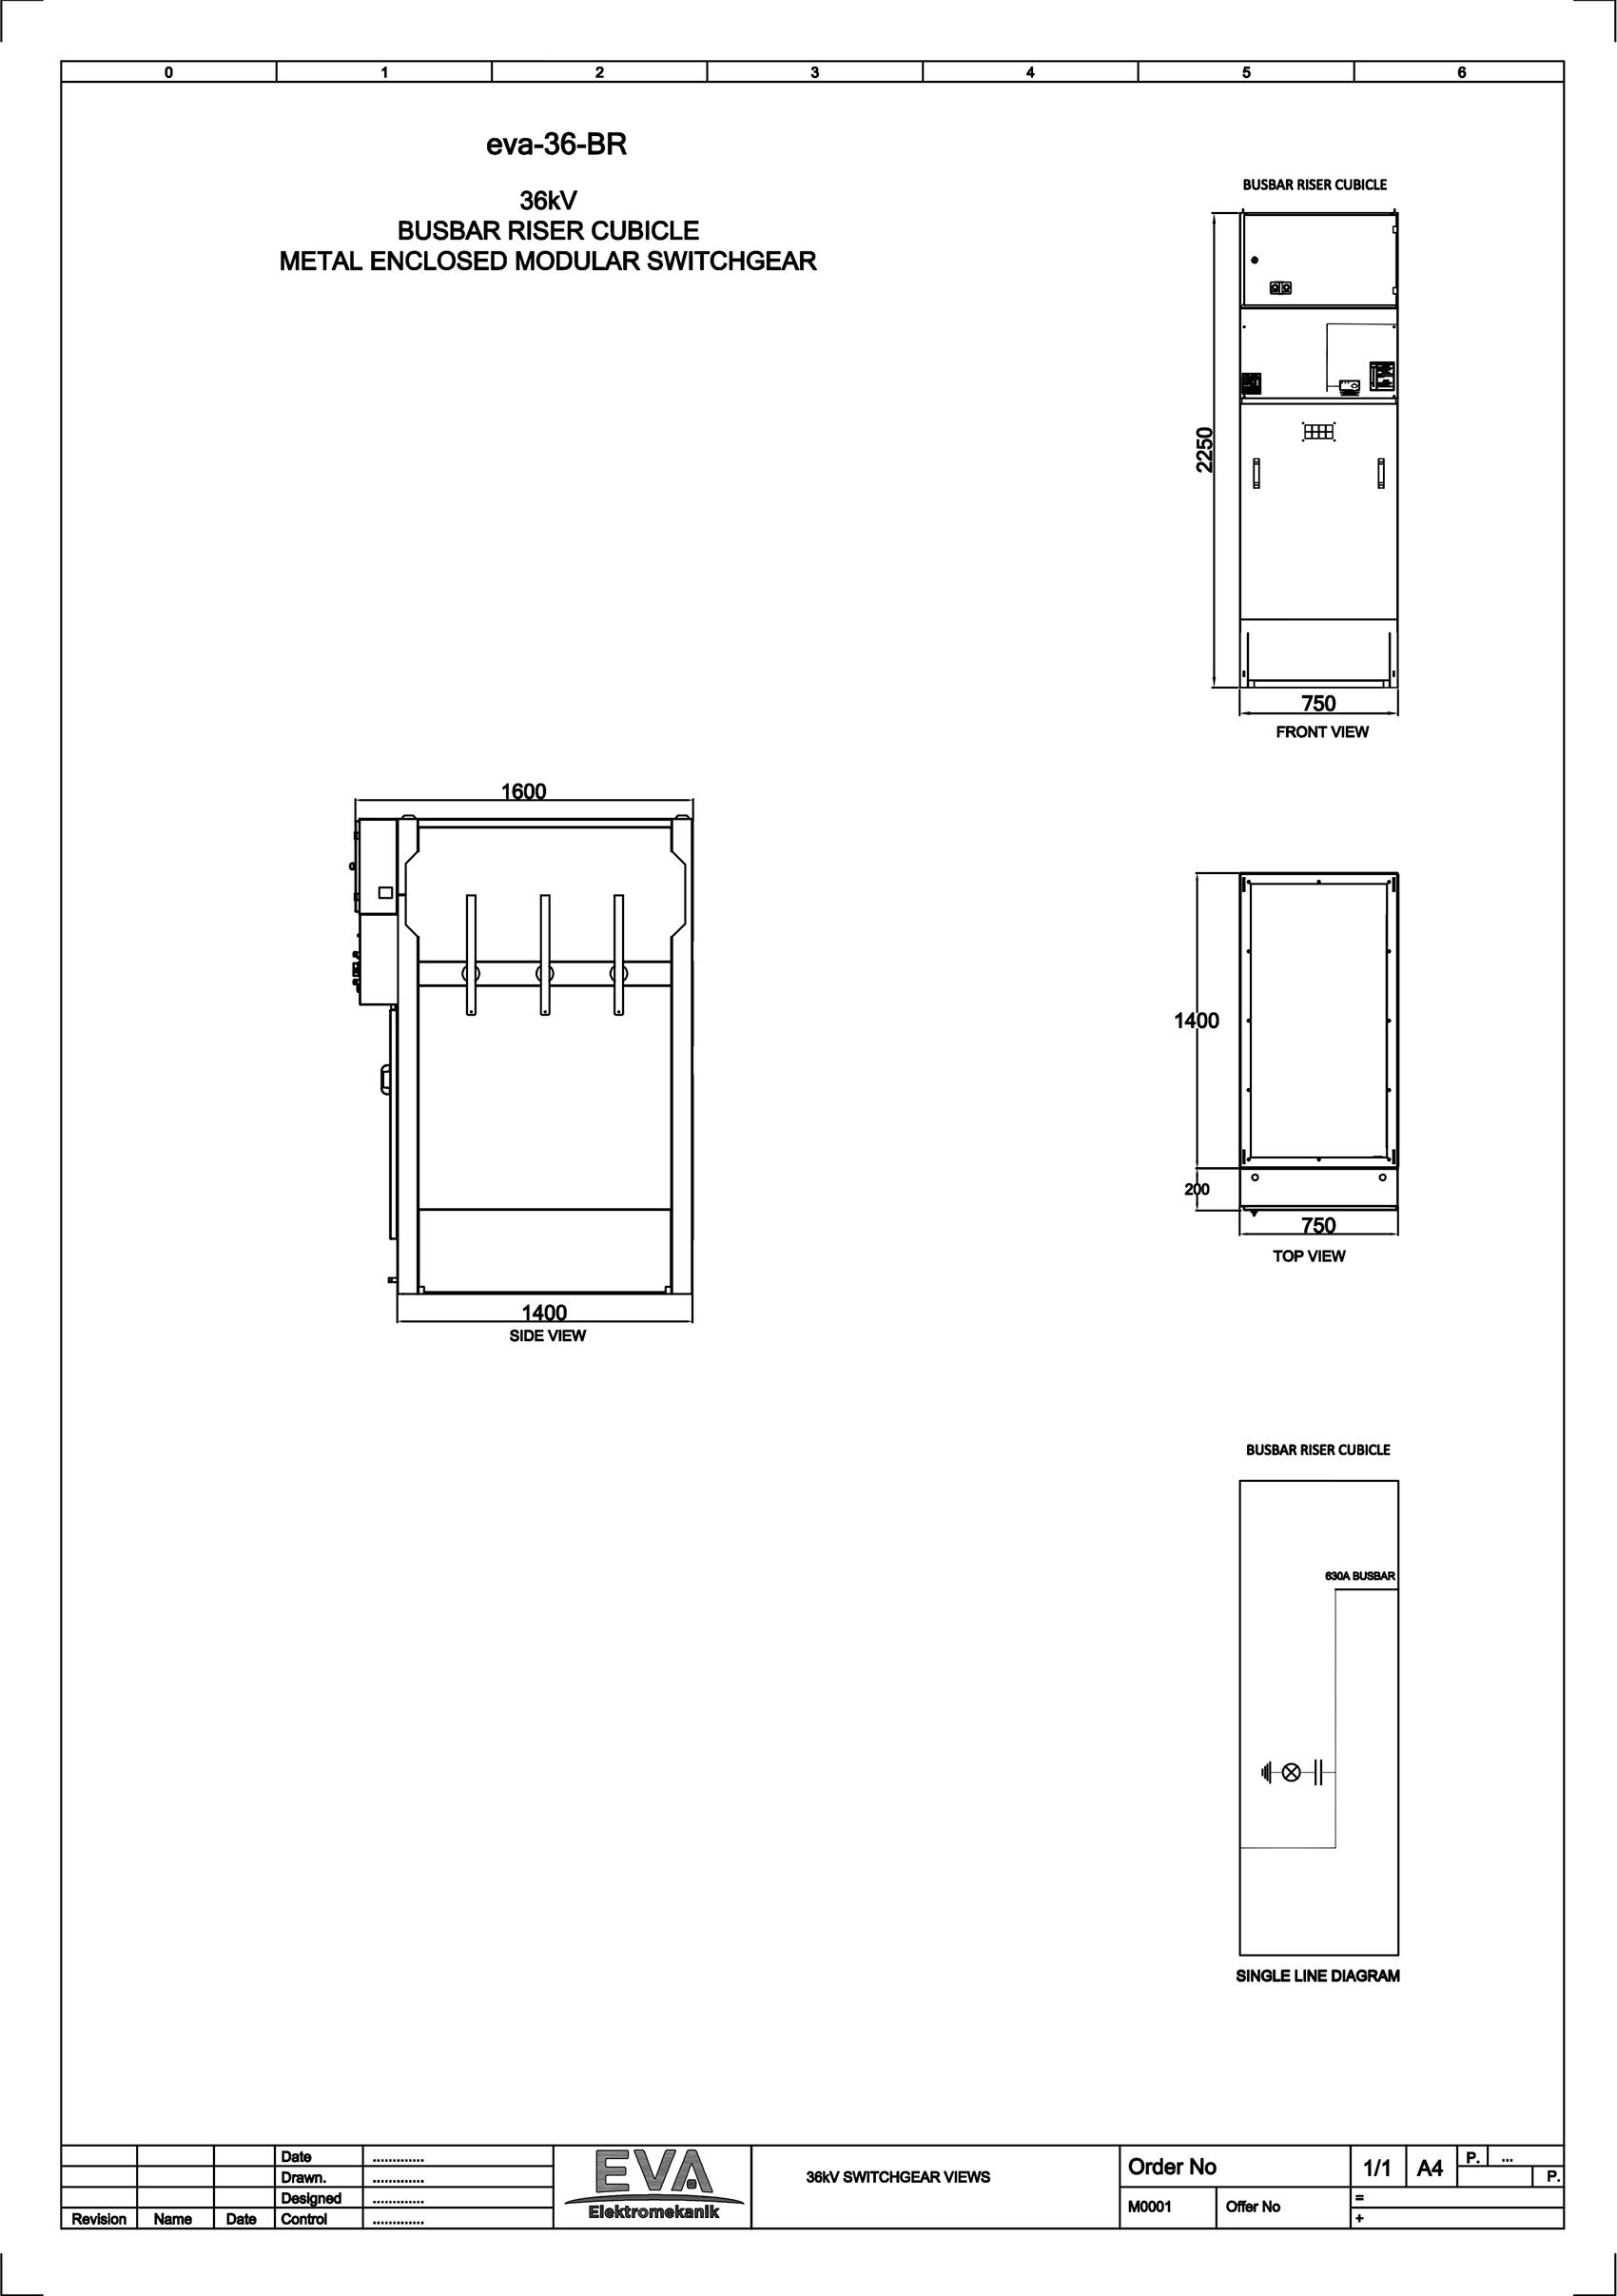 Busbar Riser Cubicle